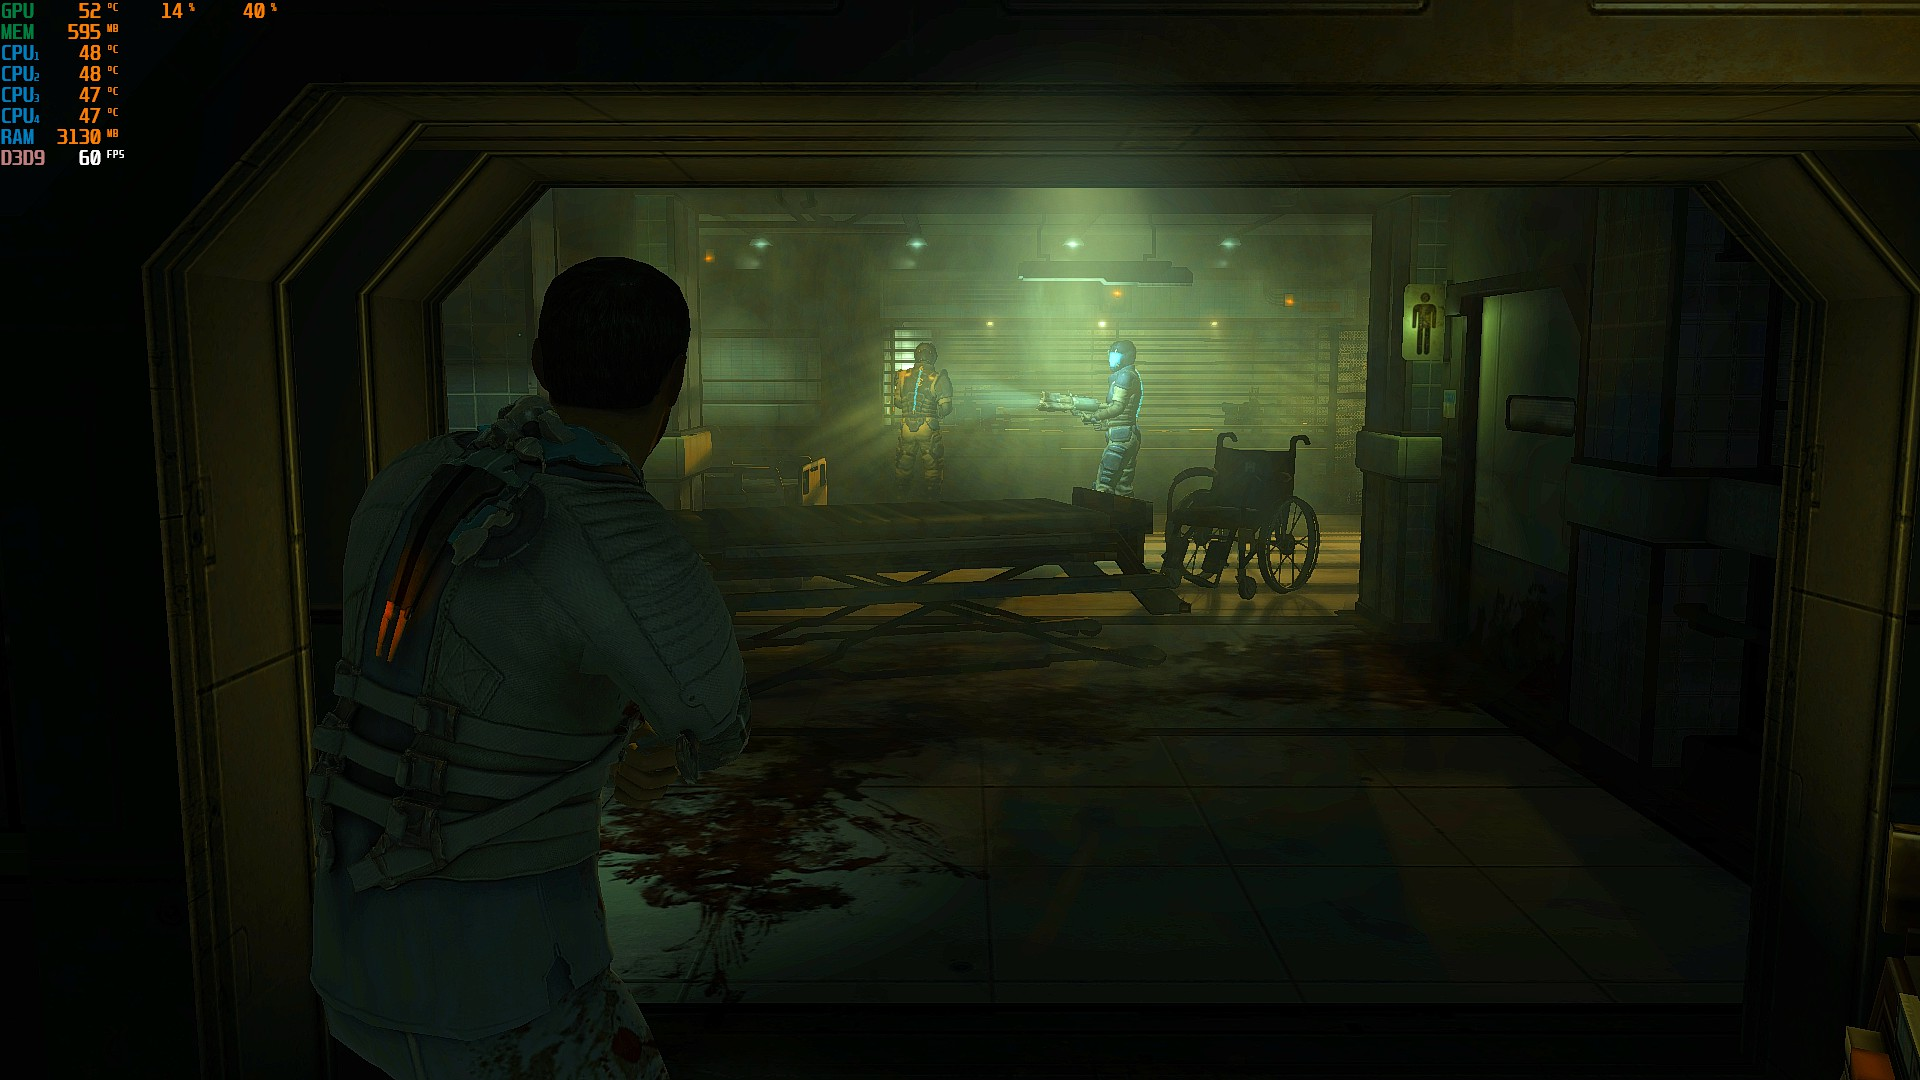 00017.Jpg - Dead Space 2